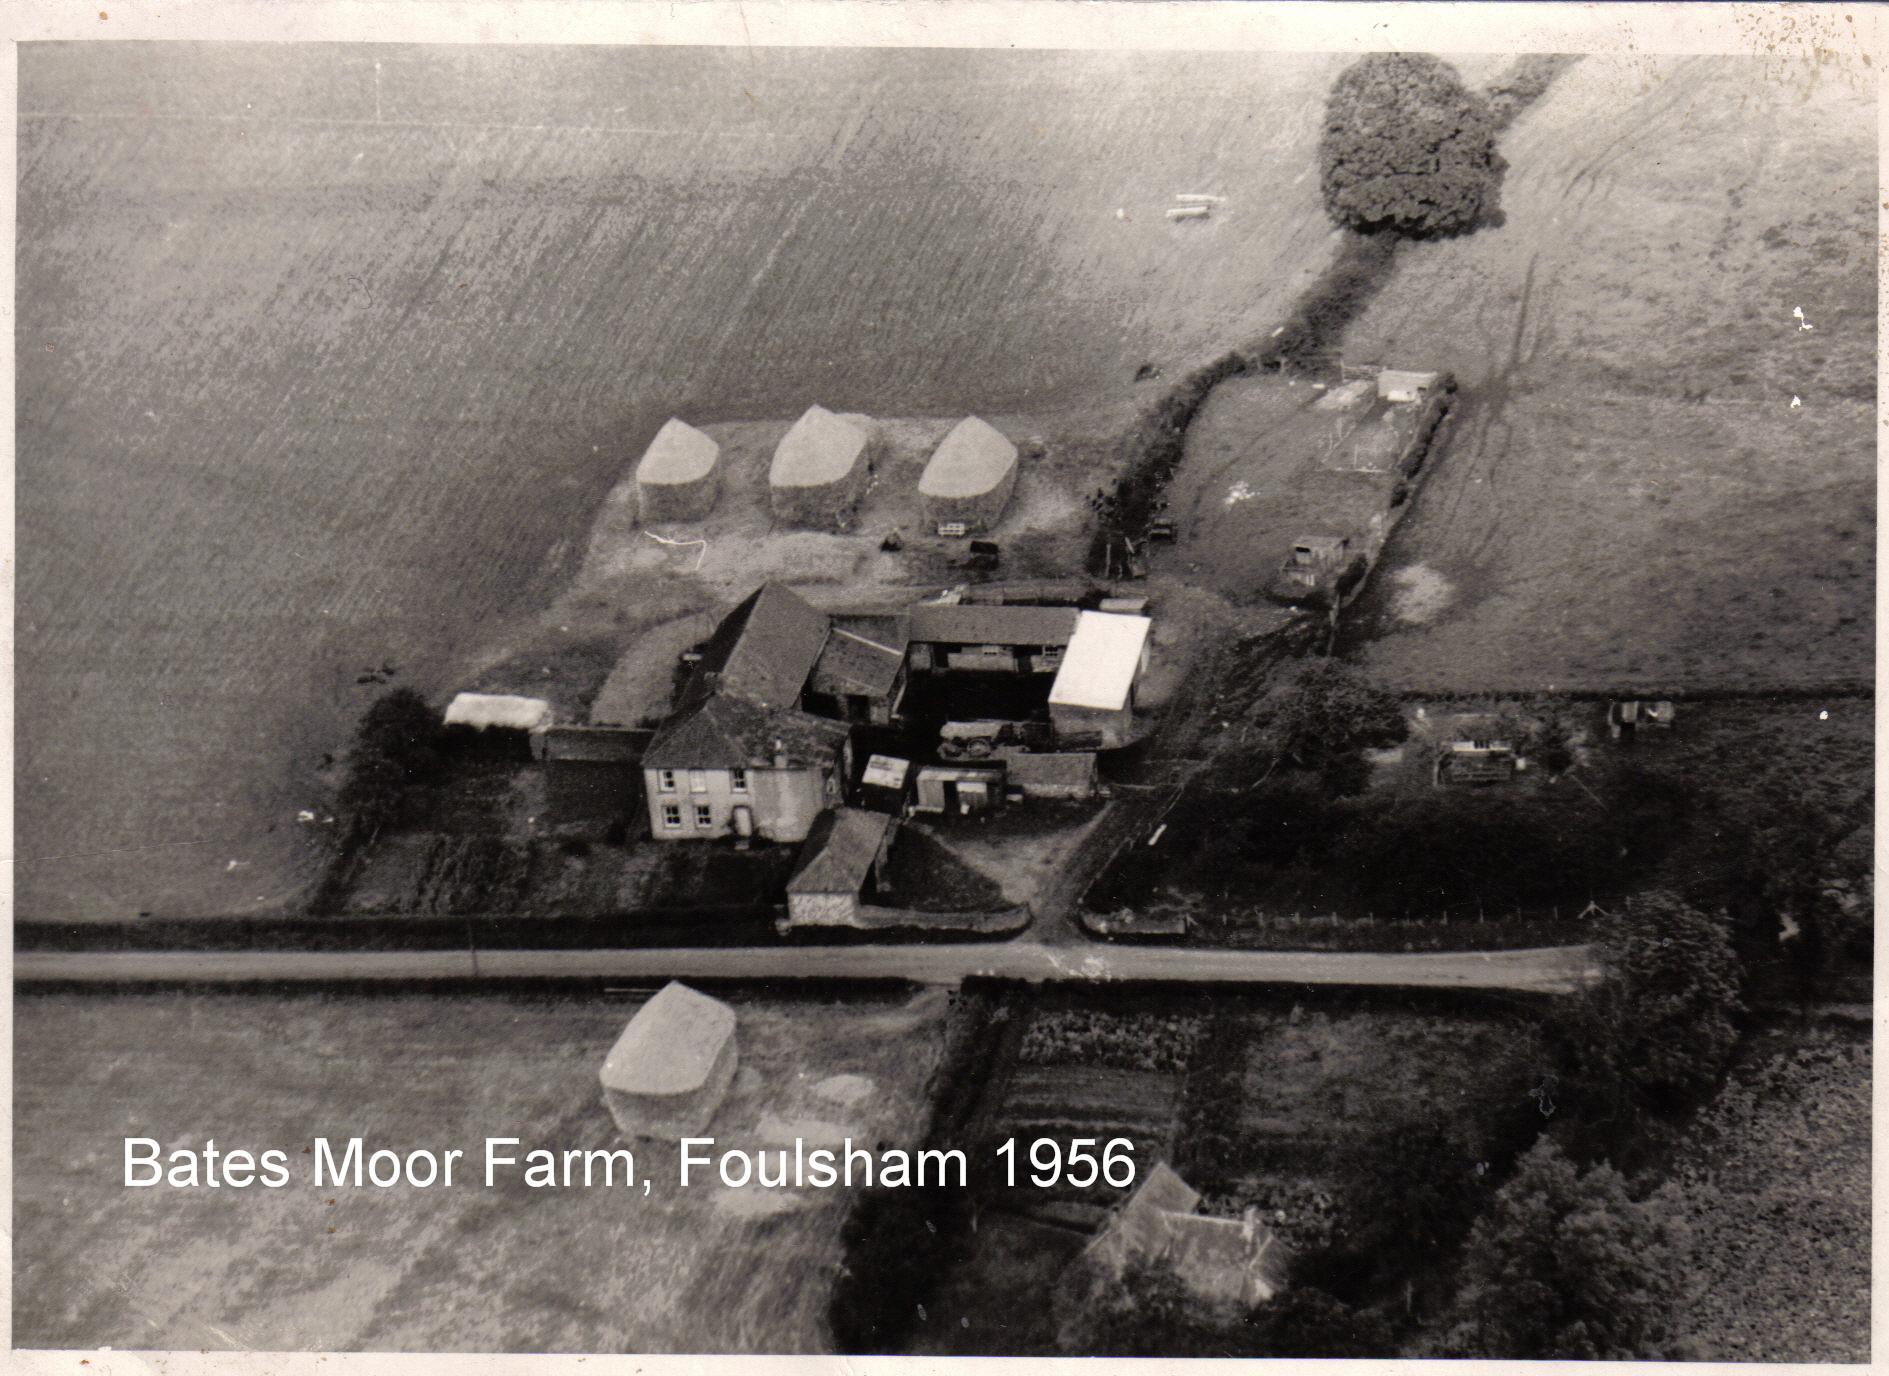 Main Images - Bates_Moor_Farm.jpg (1889px x 1376px)